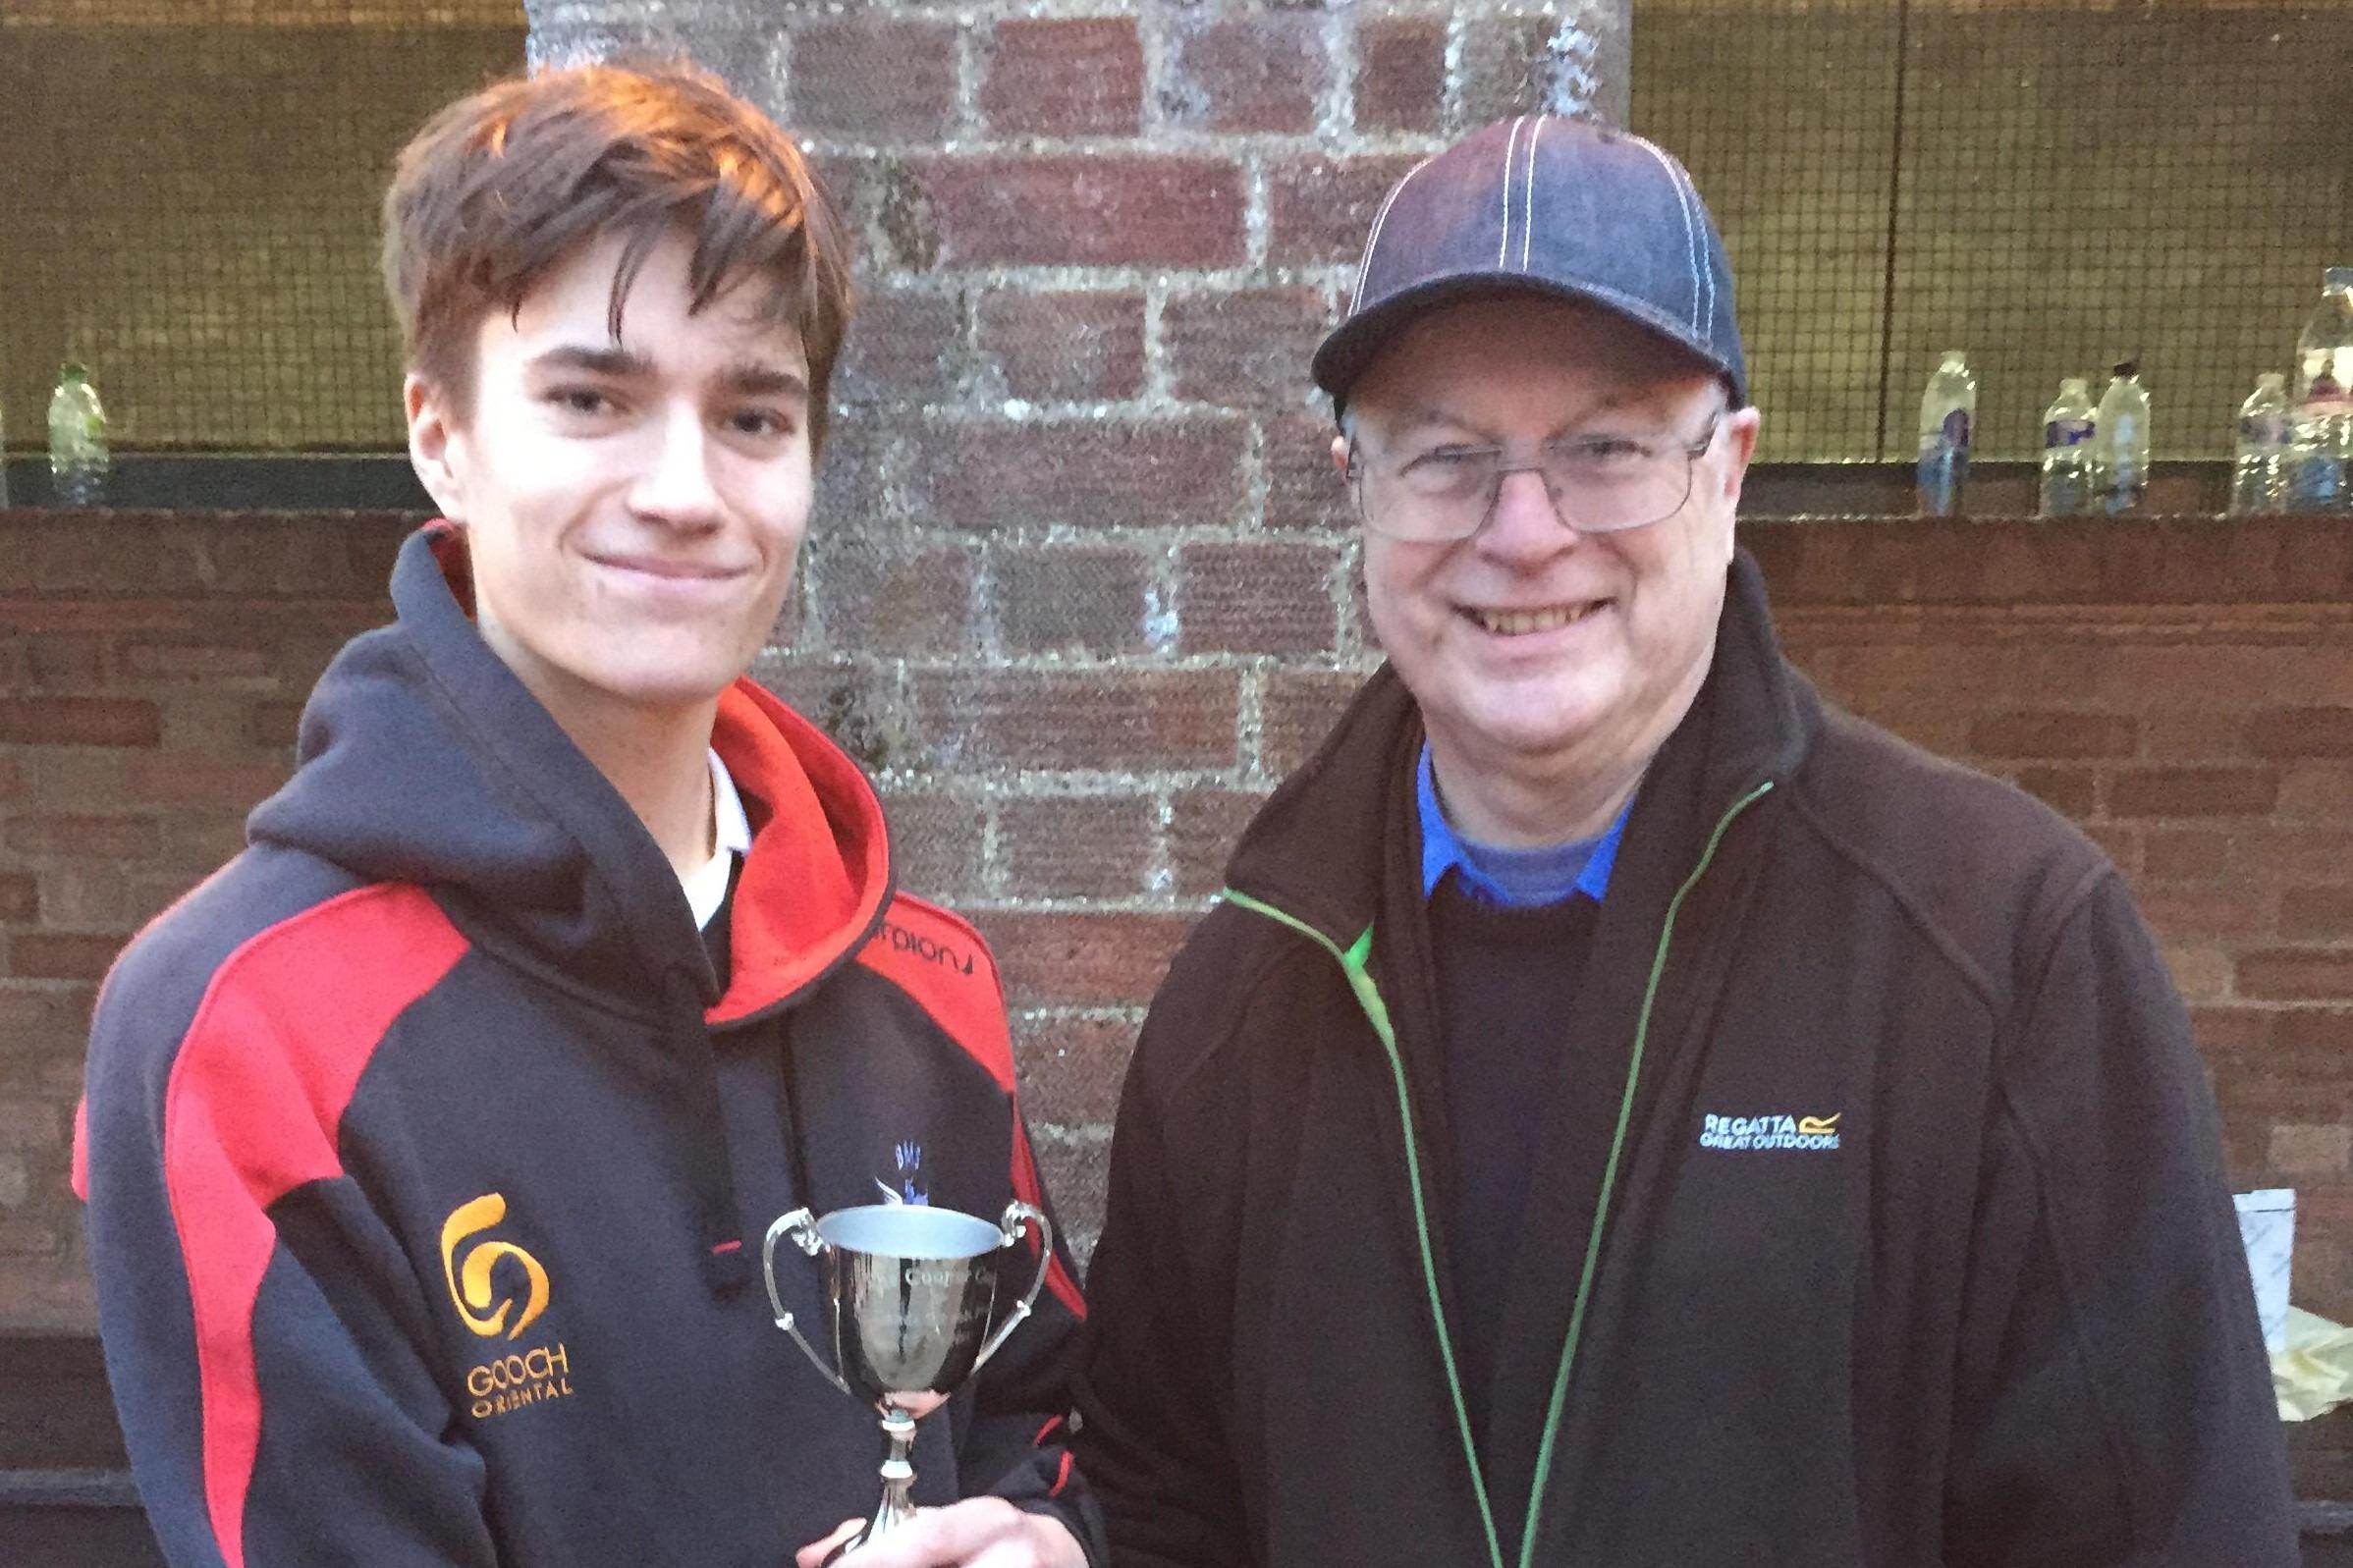 Joe Sumner, Quarry Cup winner 2017